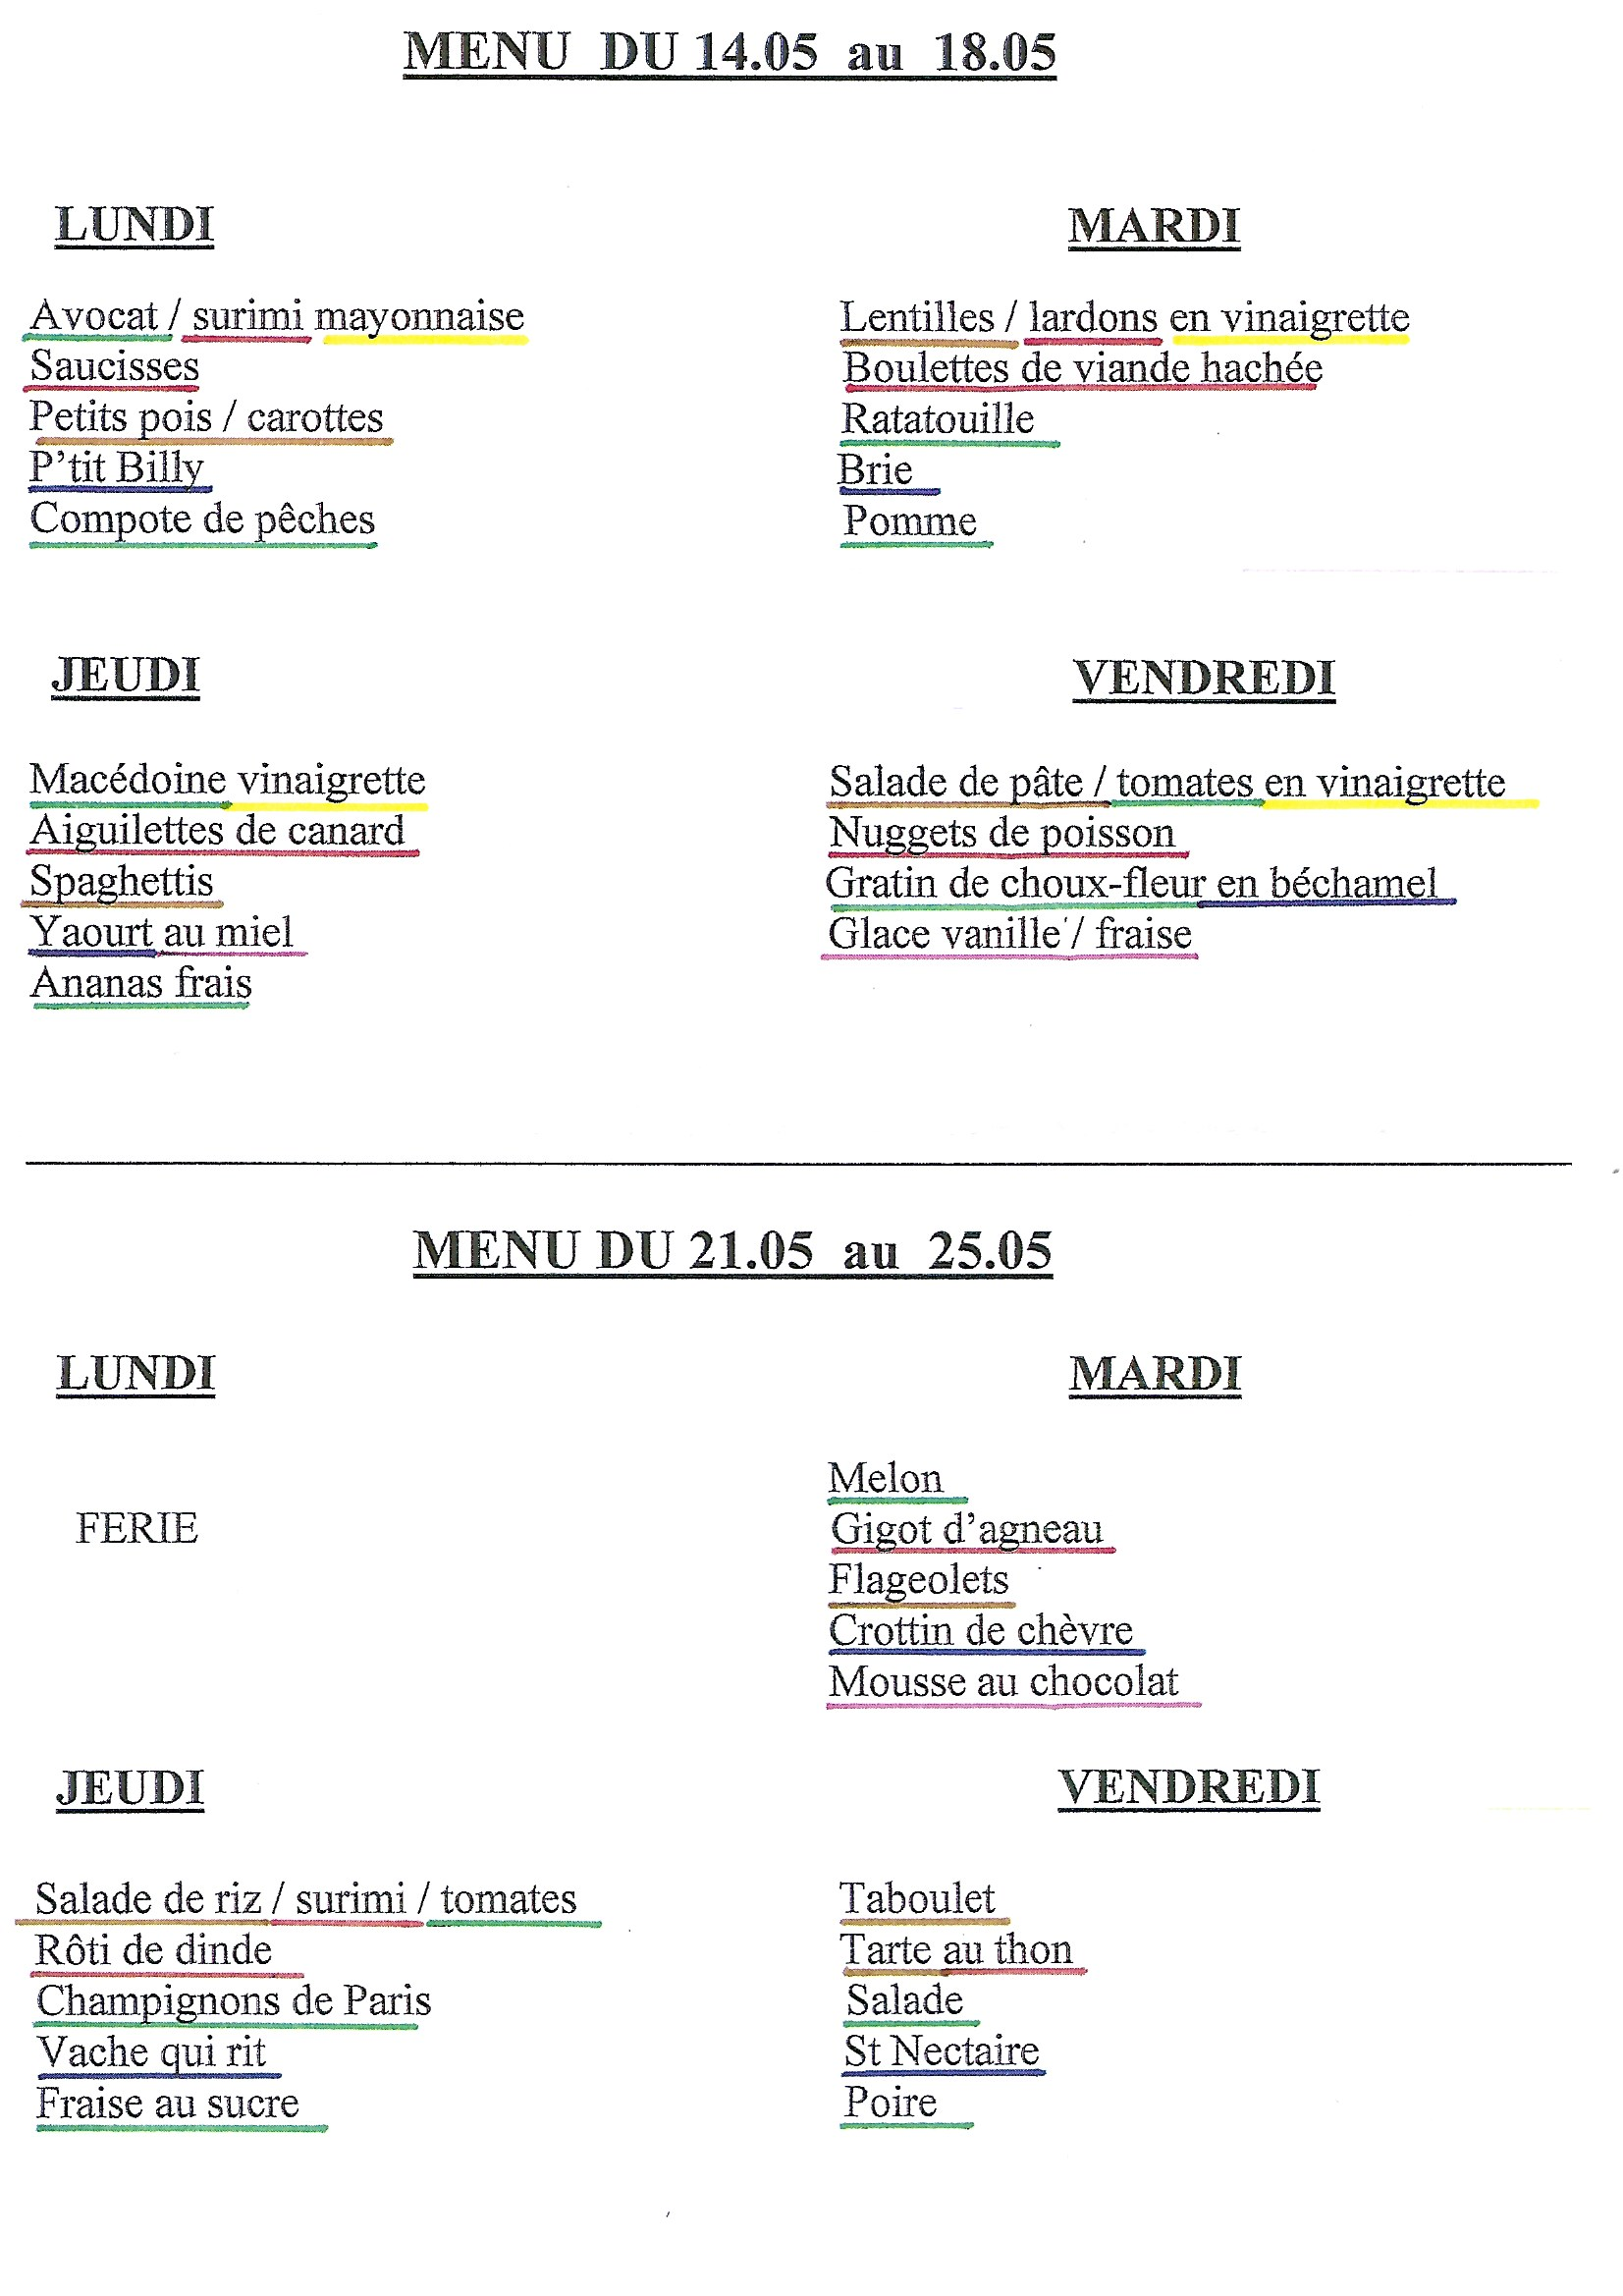 menus cantine du 14 au 25 mai